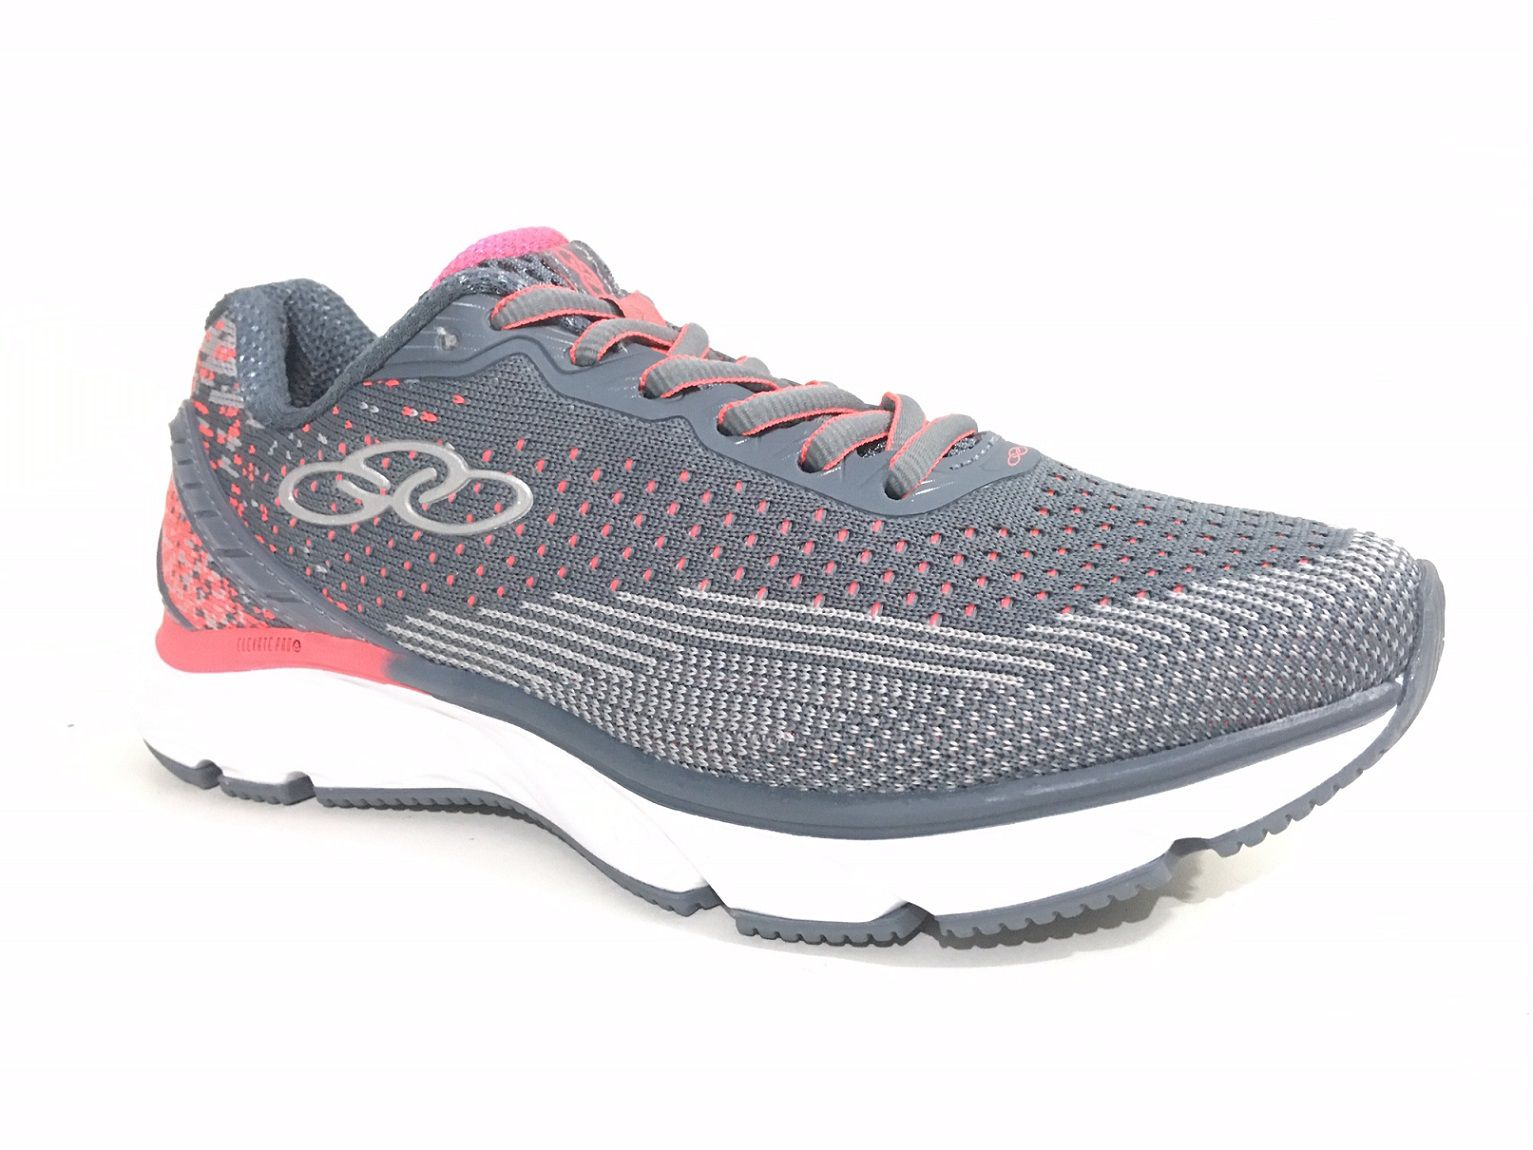 d1bf5457b7 Tênis Nike Shox Deliver Feminino - Cinza/Rosa - Joinville Sportcenter